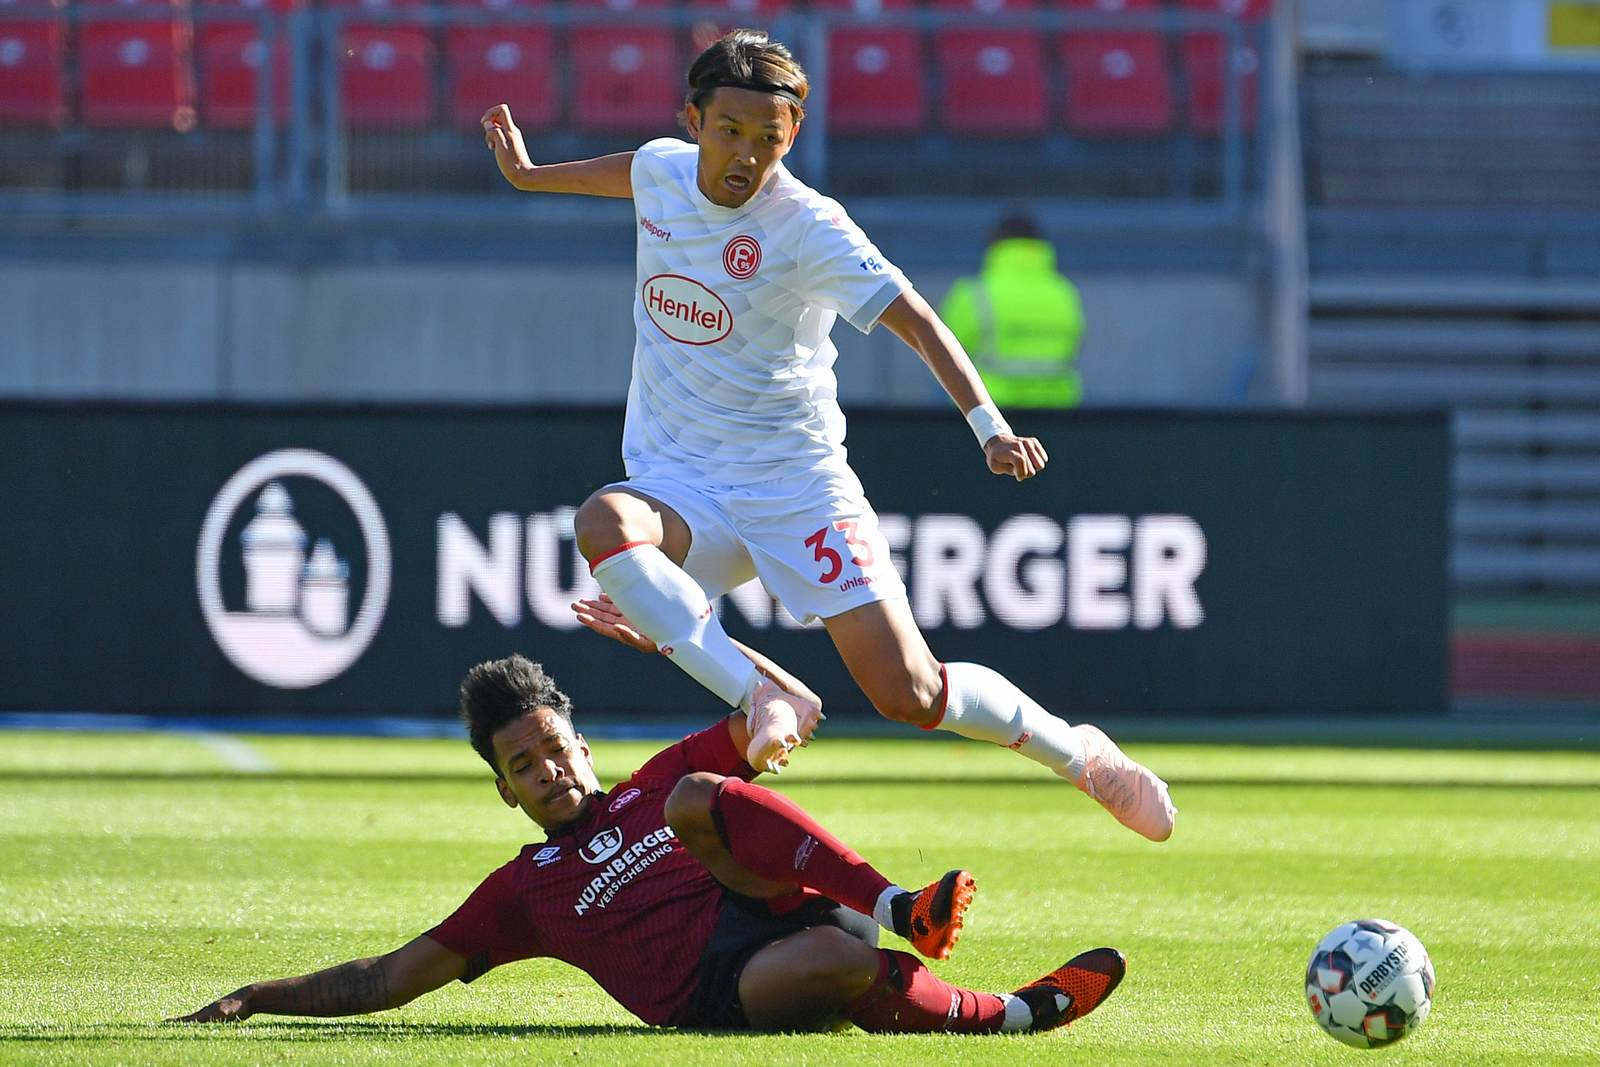 Takashi Usami gegen Matheus Pereira. Jetzt auf Düsseldorf vs Nürnberg wetten